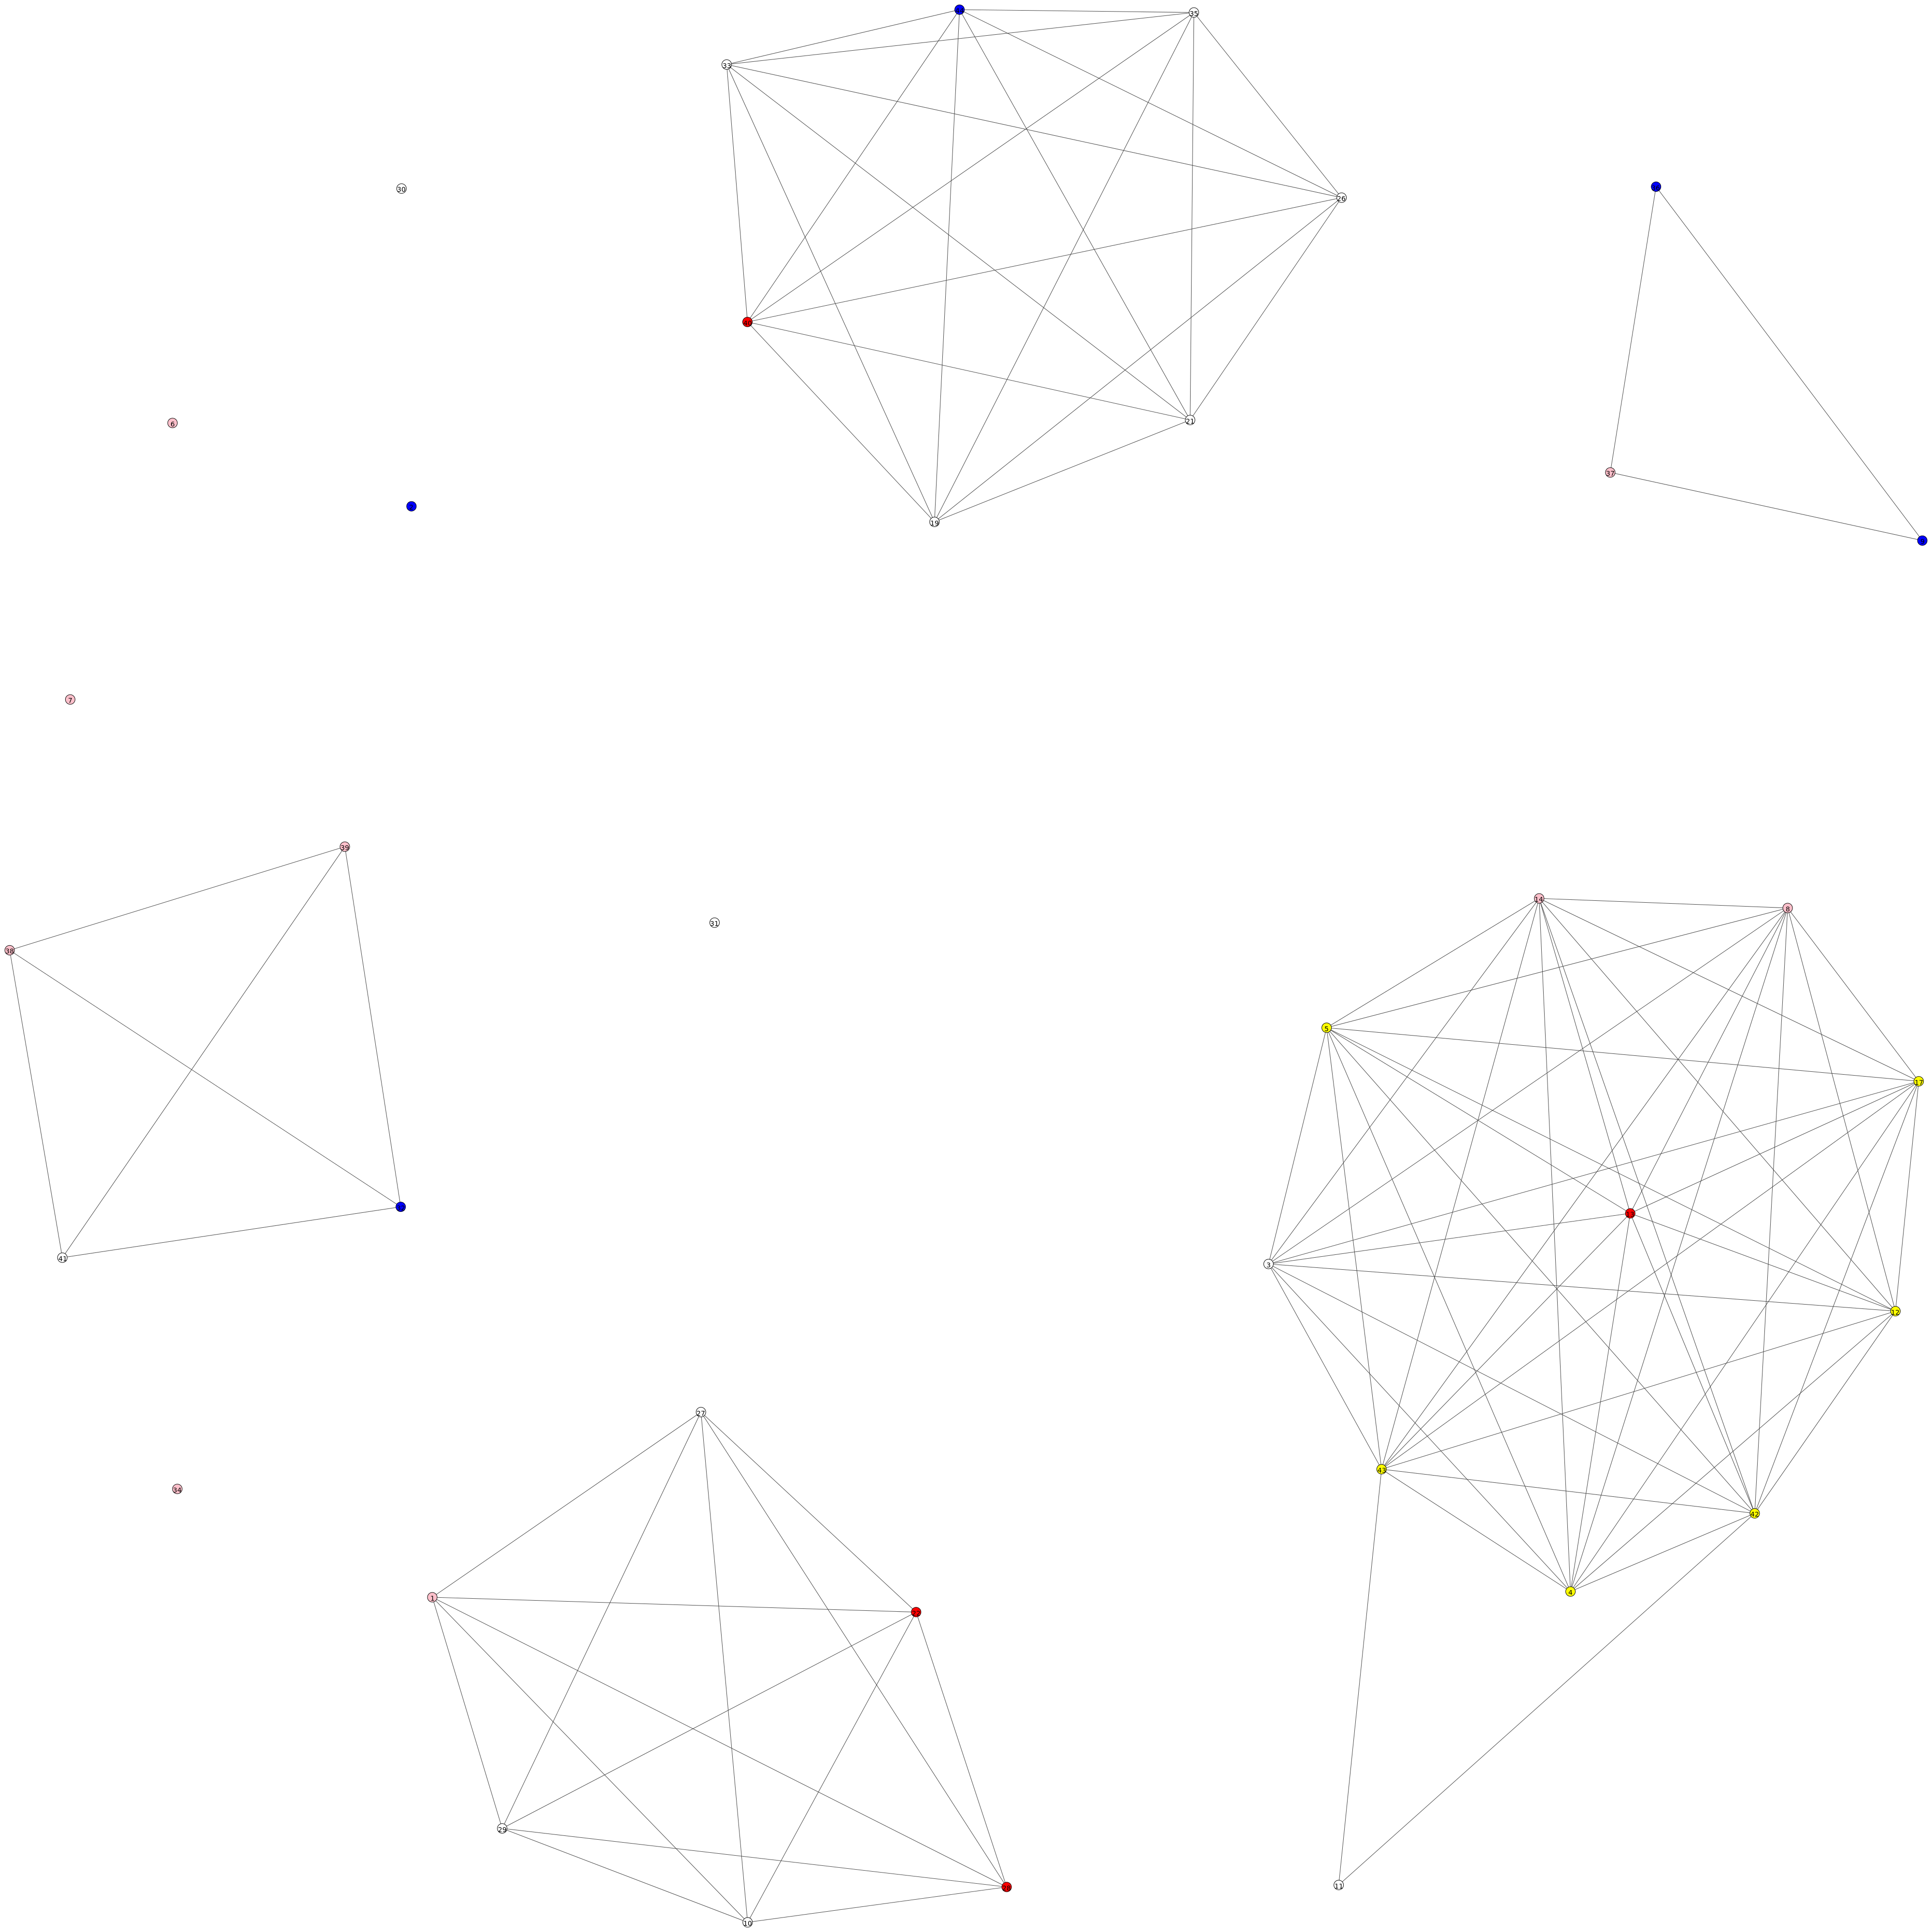 graph_kk.png